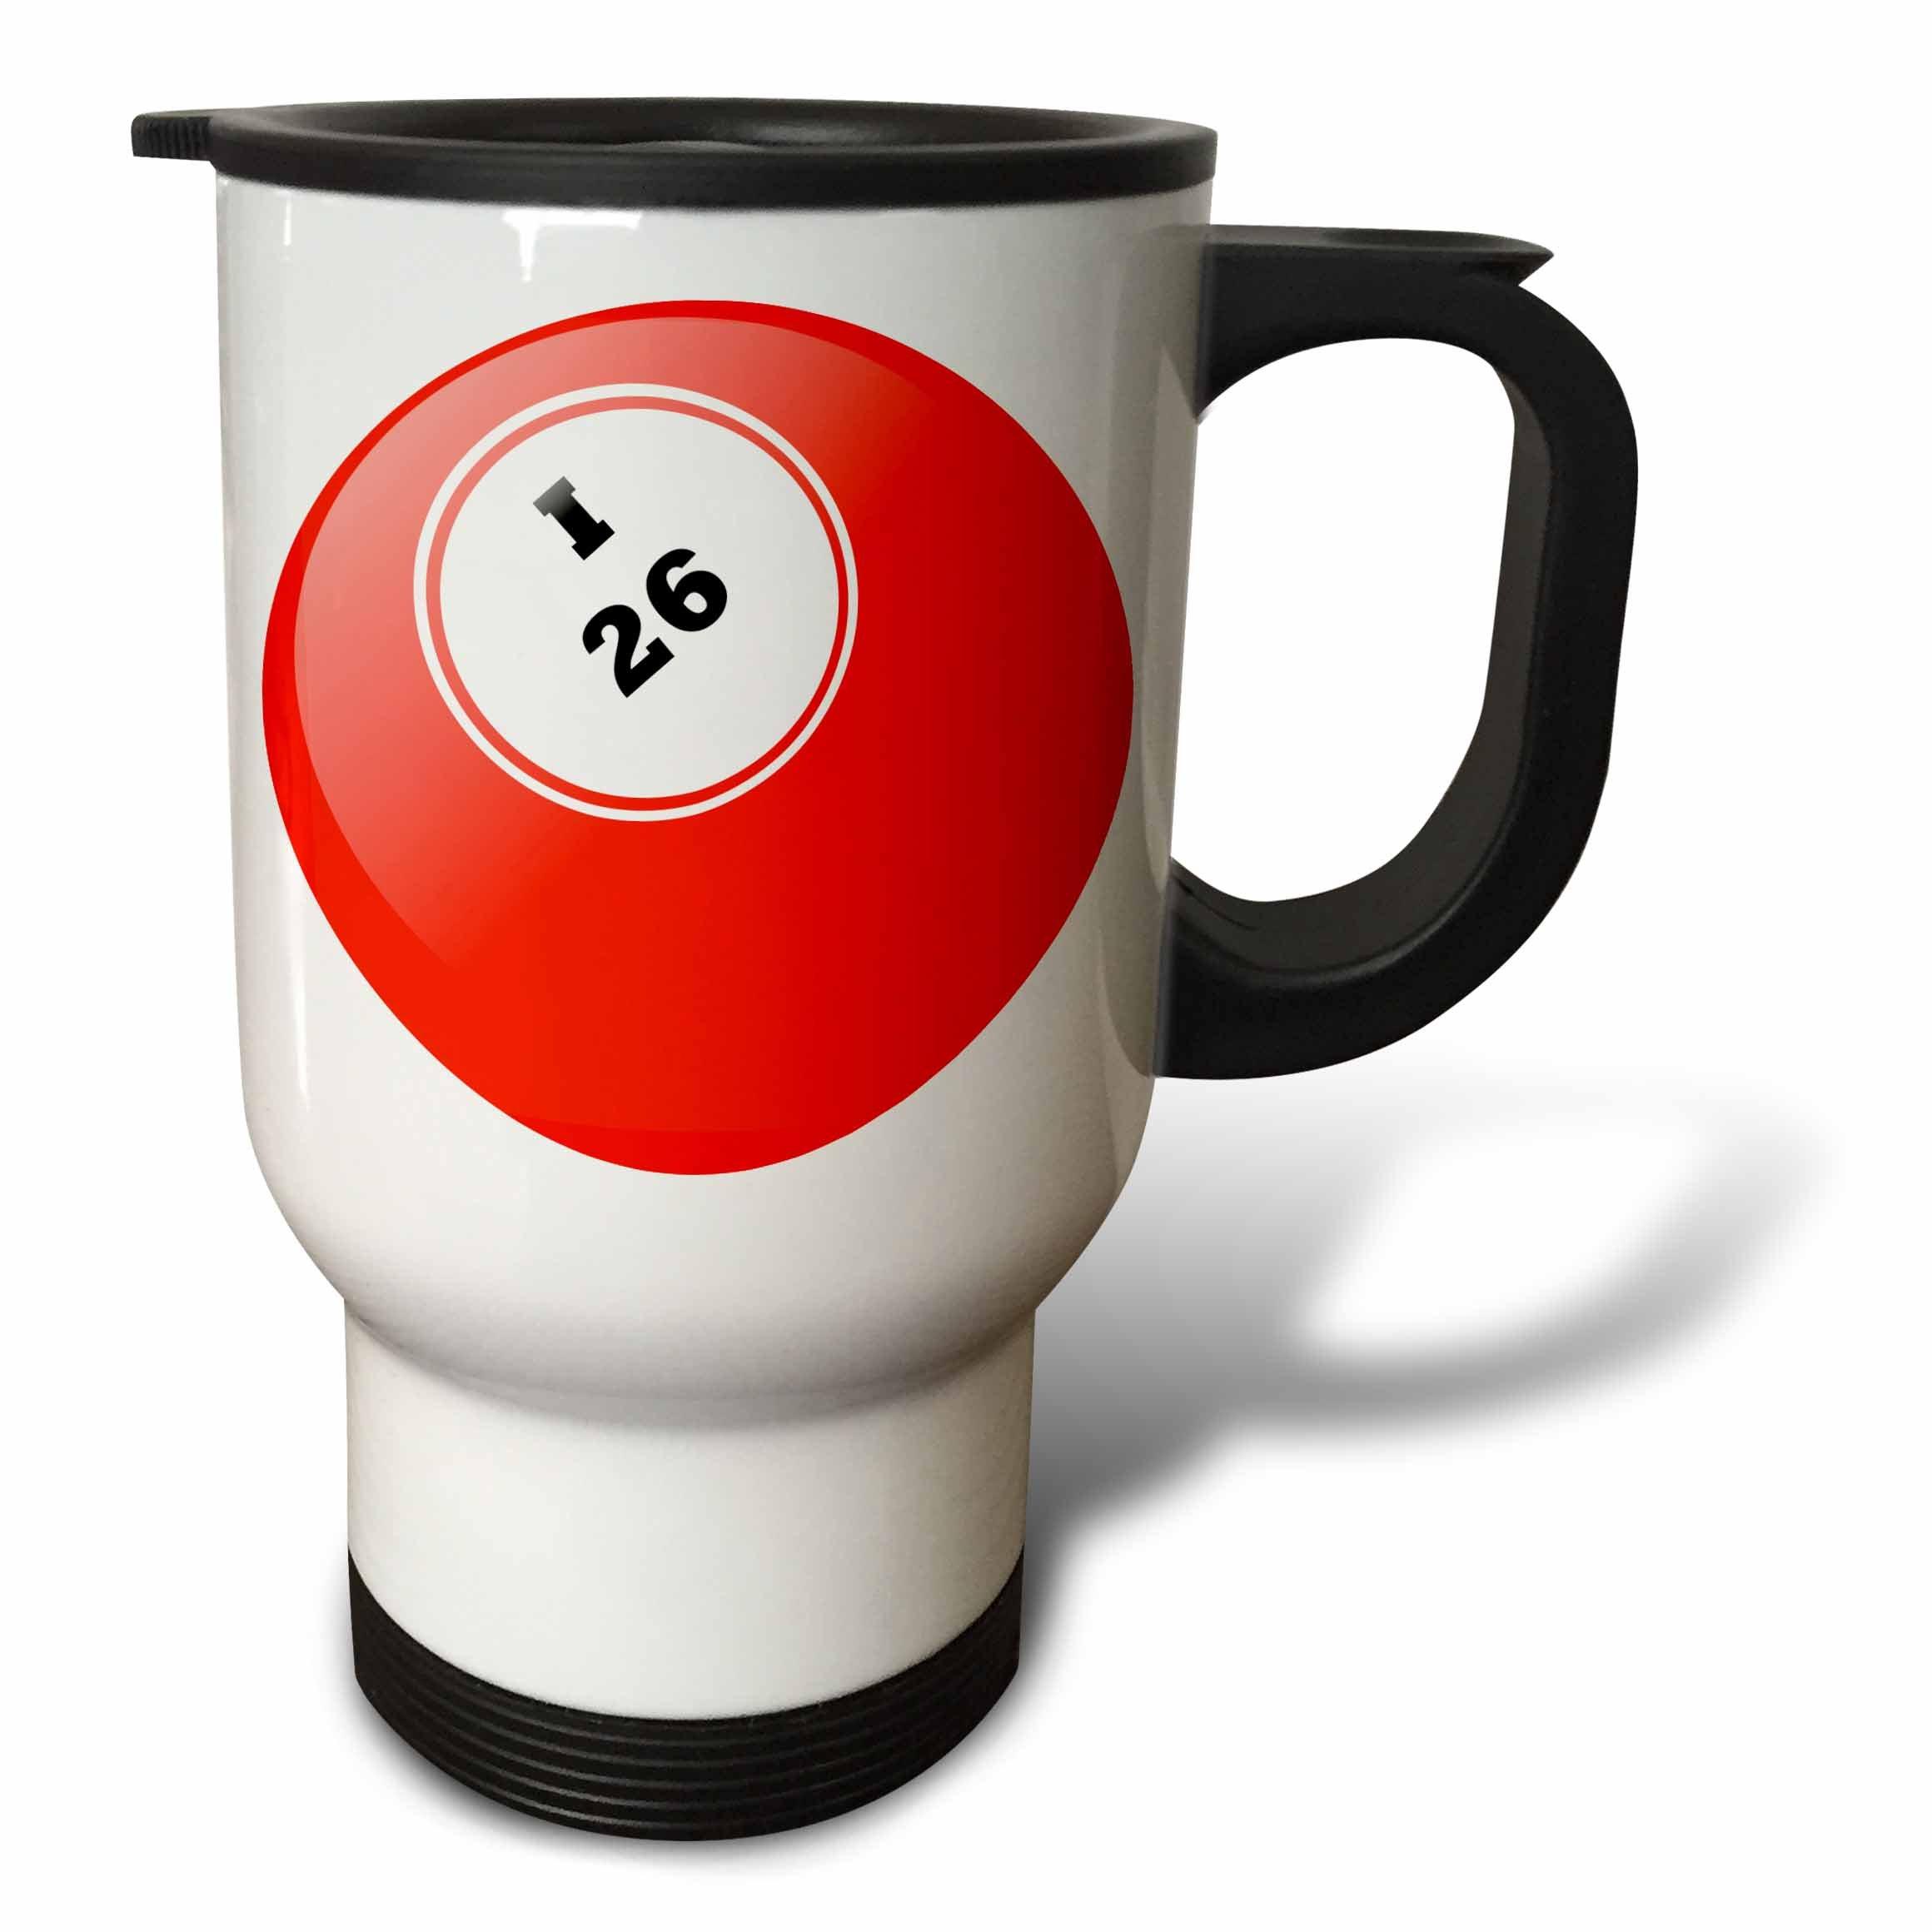 3dRose tm_50294_1 Bingo I 26 Travel Mug, 14-Ounce, Stainless Steel by 3dRose